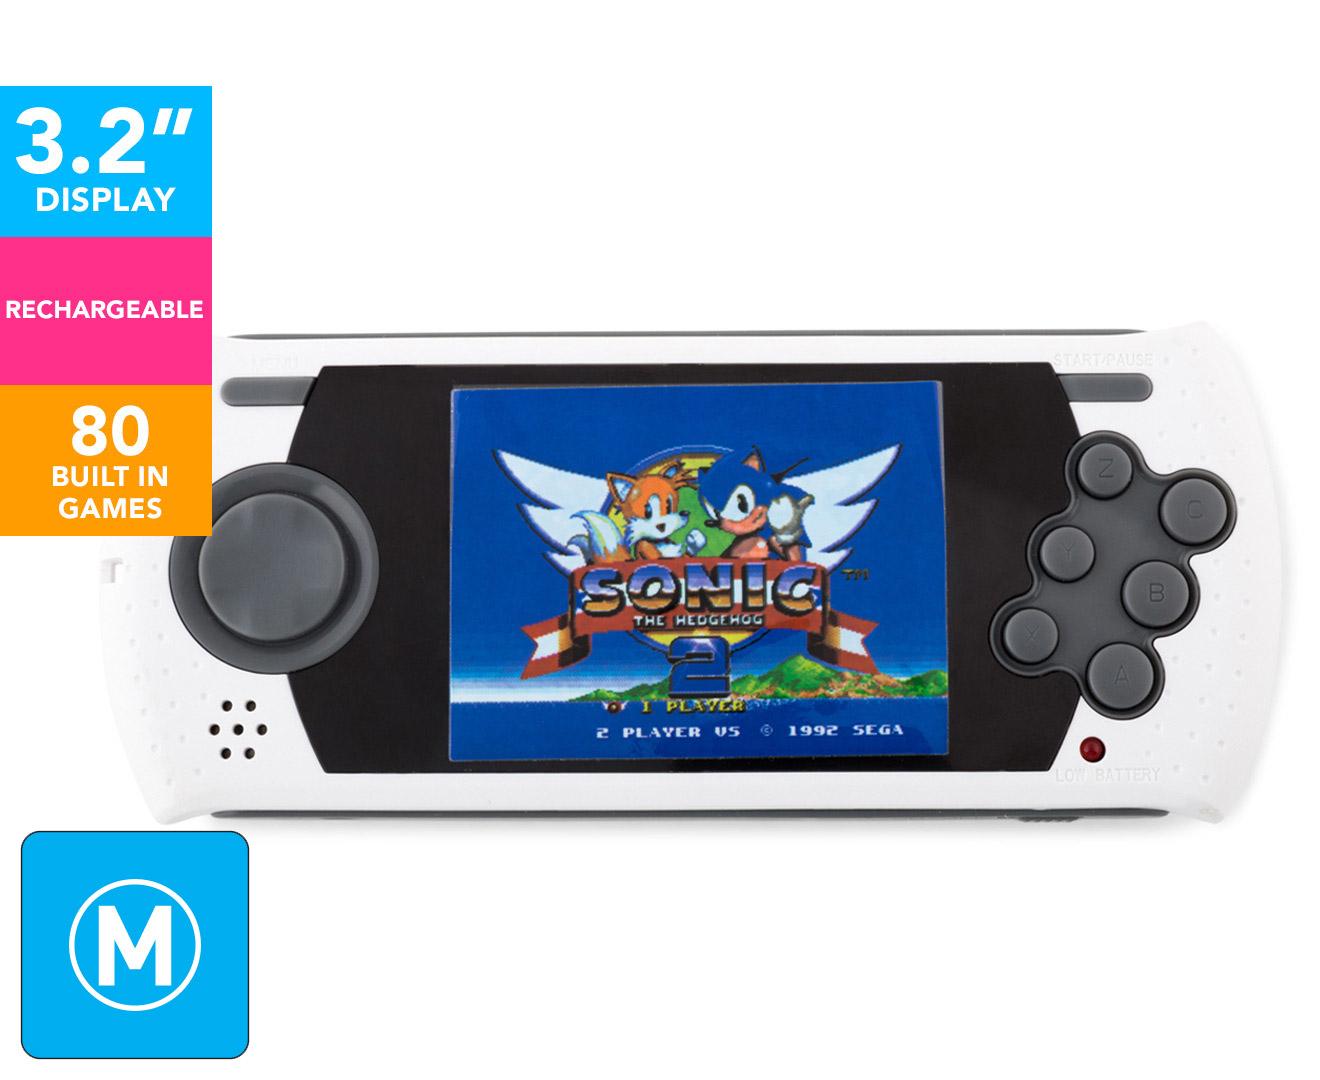 Sega Genesis Ultimate Portable Game Player for sale online